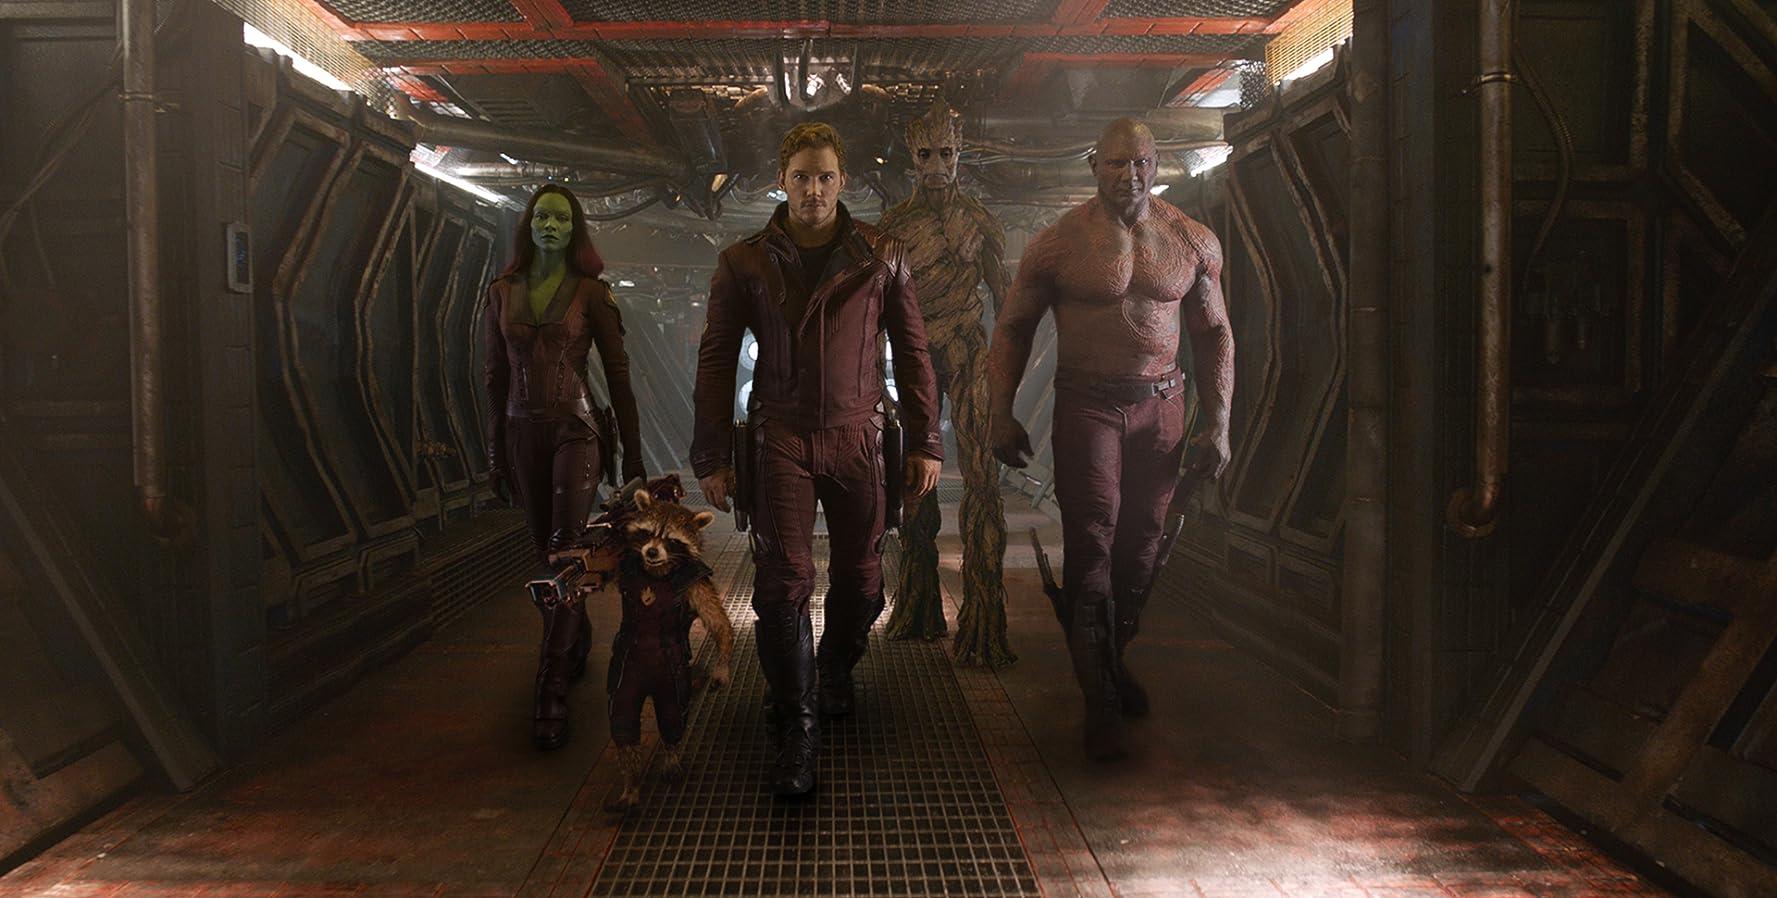 Vin Diesel, Bradley Cooper, Sean Gunn, Chris Pratt, Zoe Saldana, Dave Bautista, and Krystian Godlewski in Guardians of the Galaxy (2014)